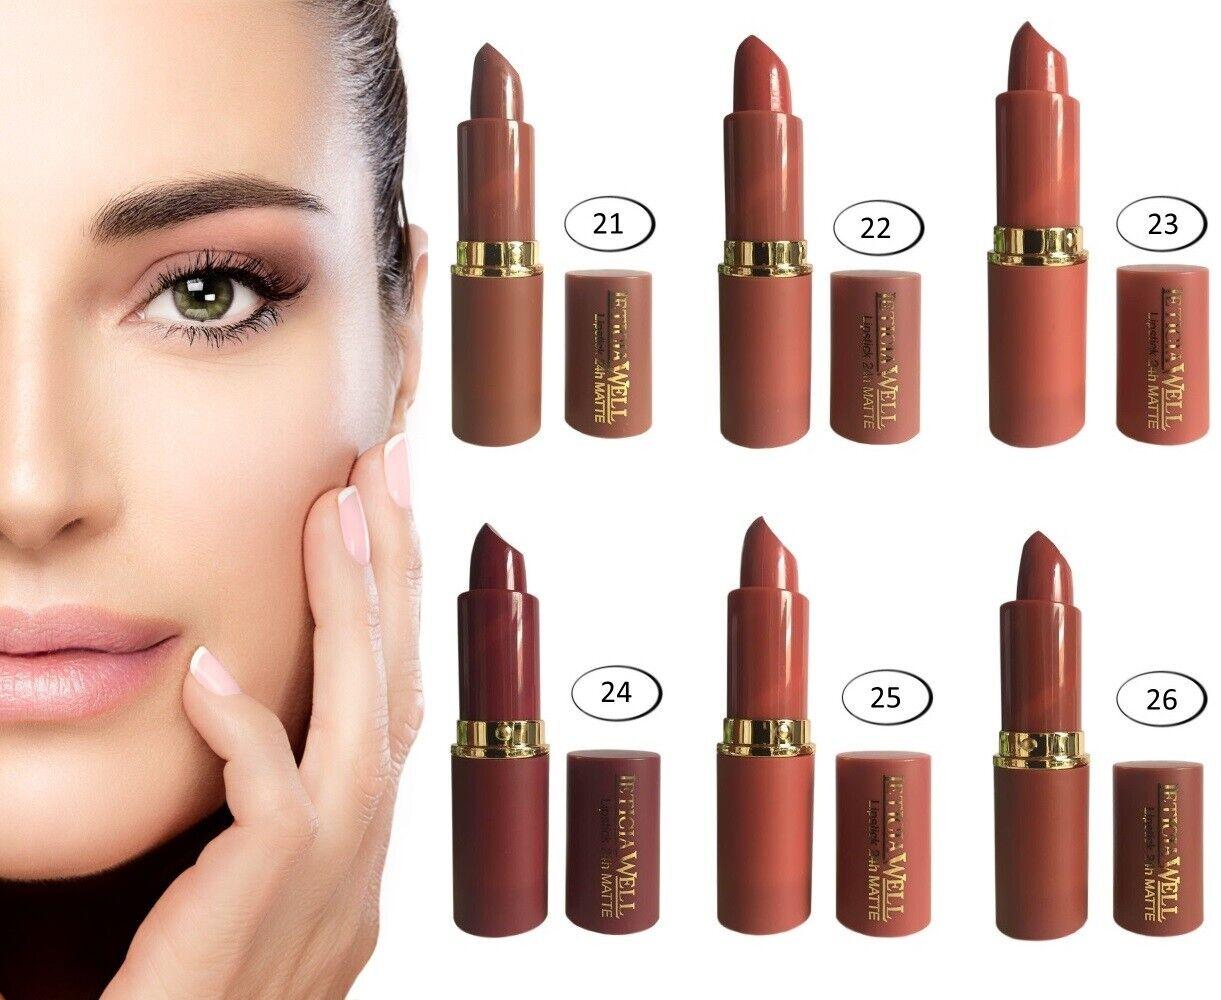 Lippenstift Matt 24h  Lipstick Braun Töne Lippenpflege Kosmetik Matter Lipliner